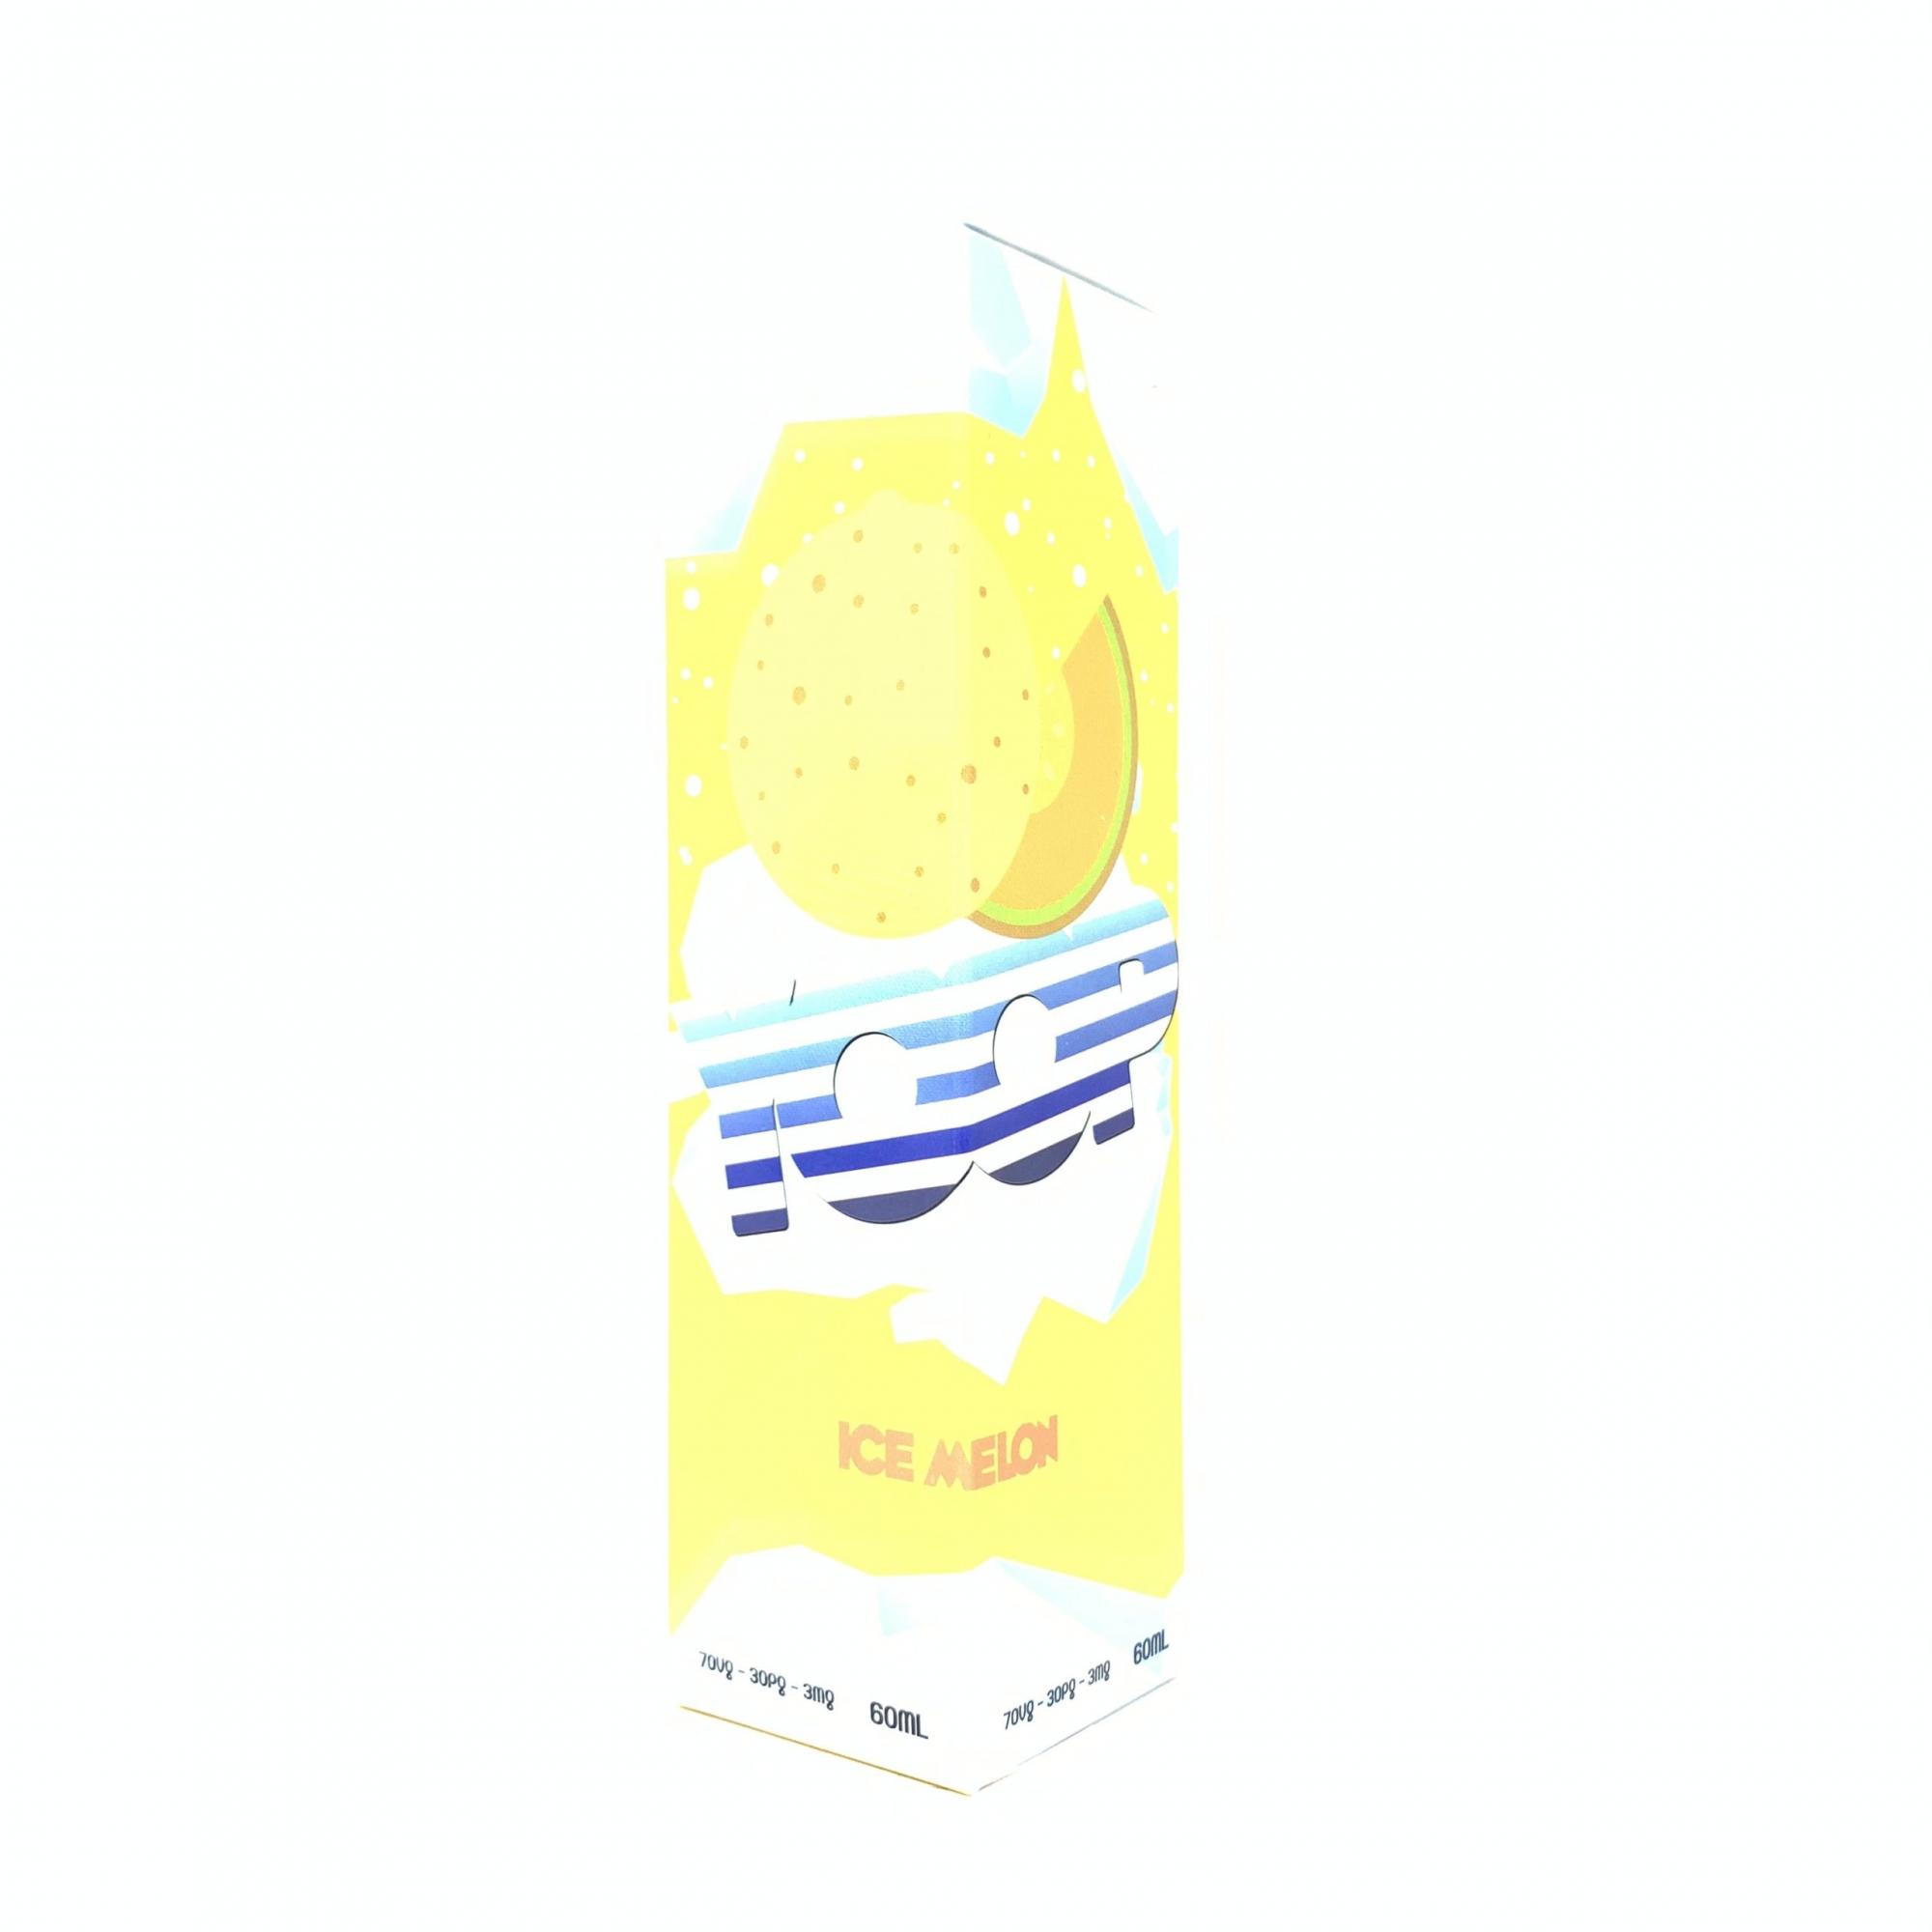 MR YOOP - Ice Melon 60ml